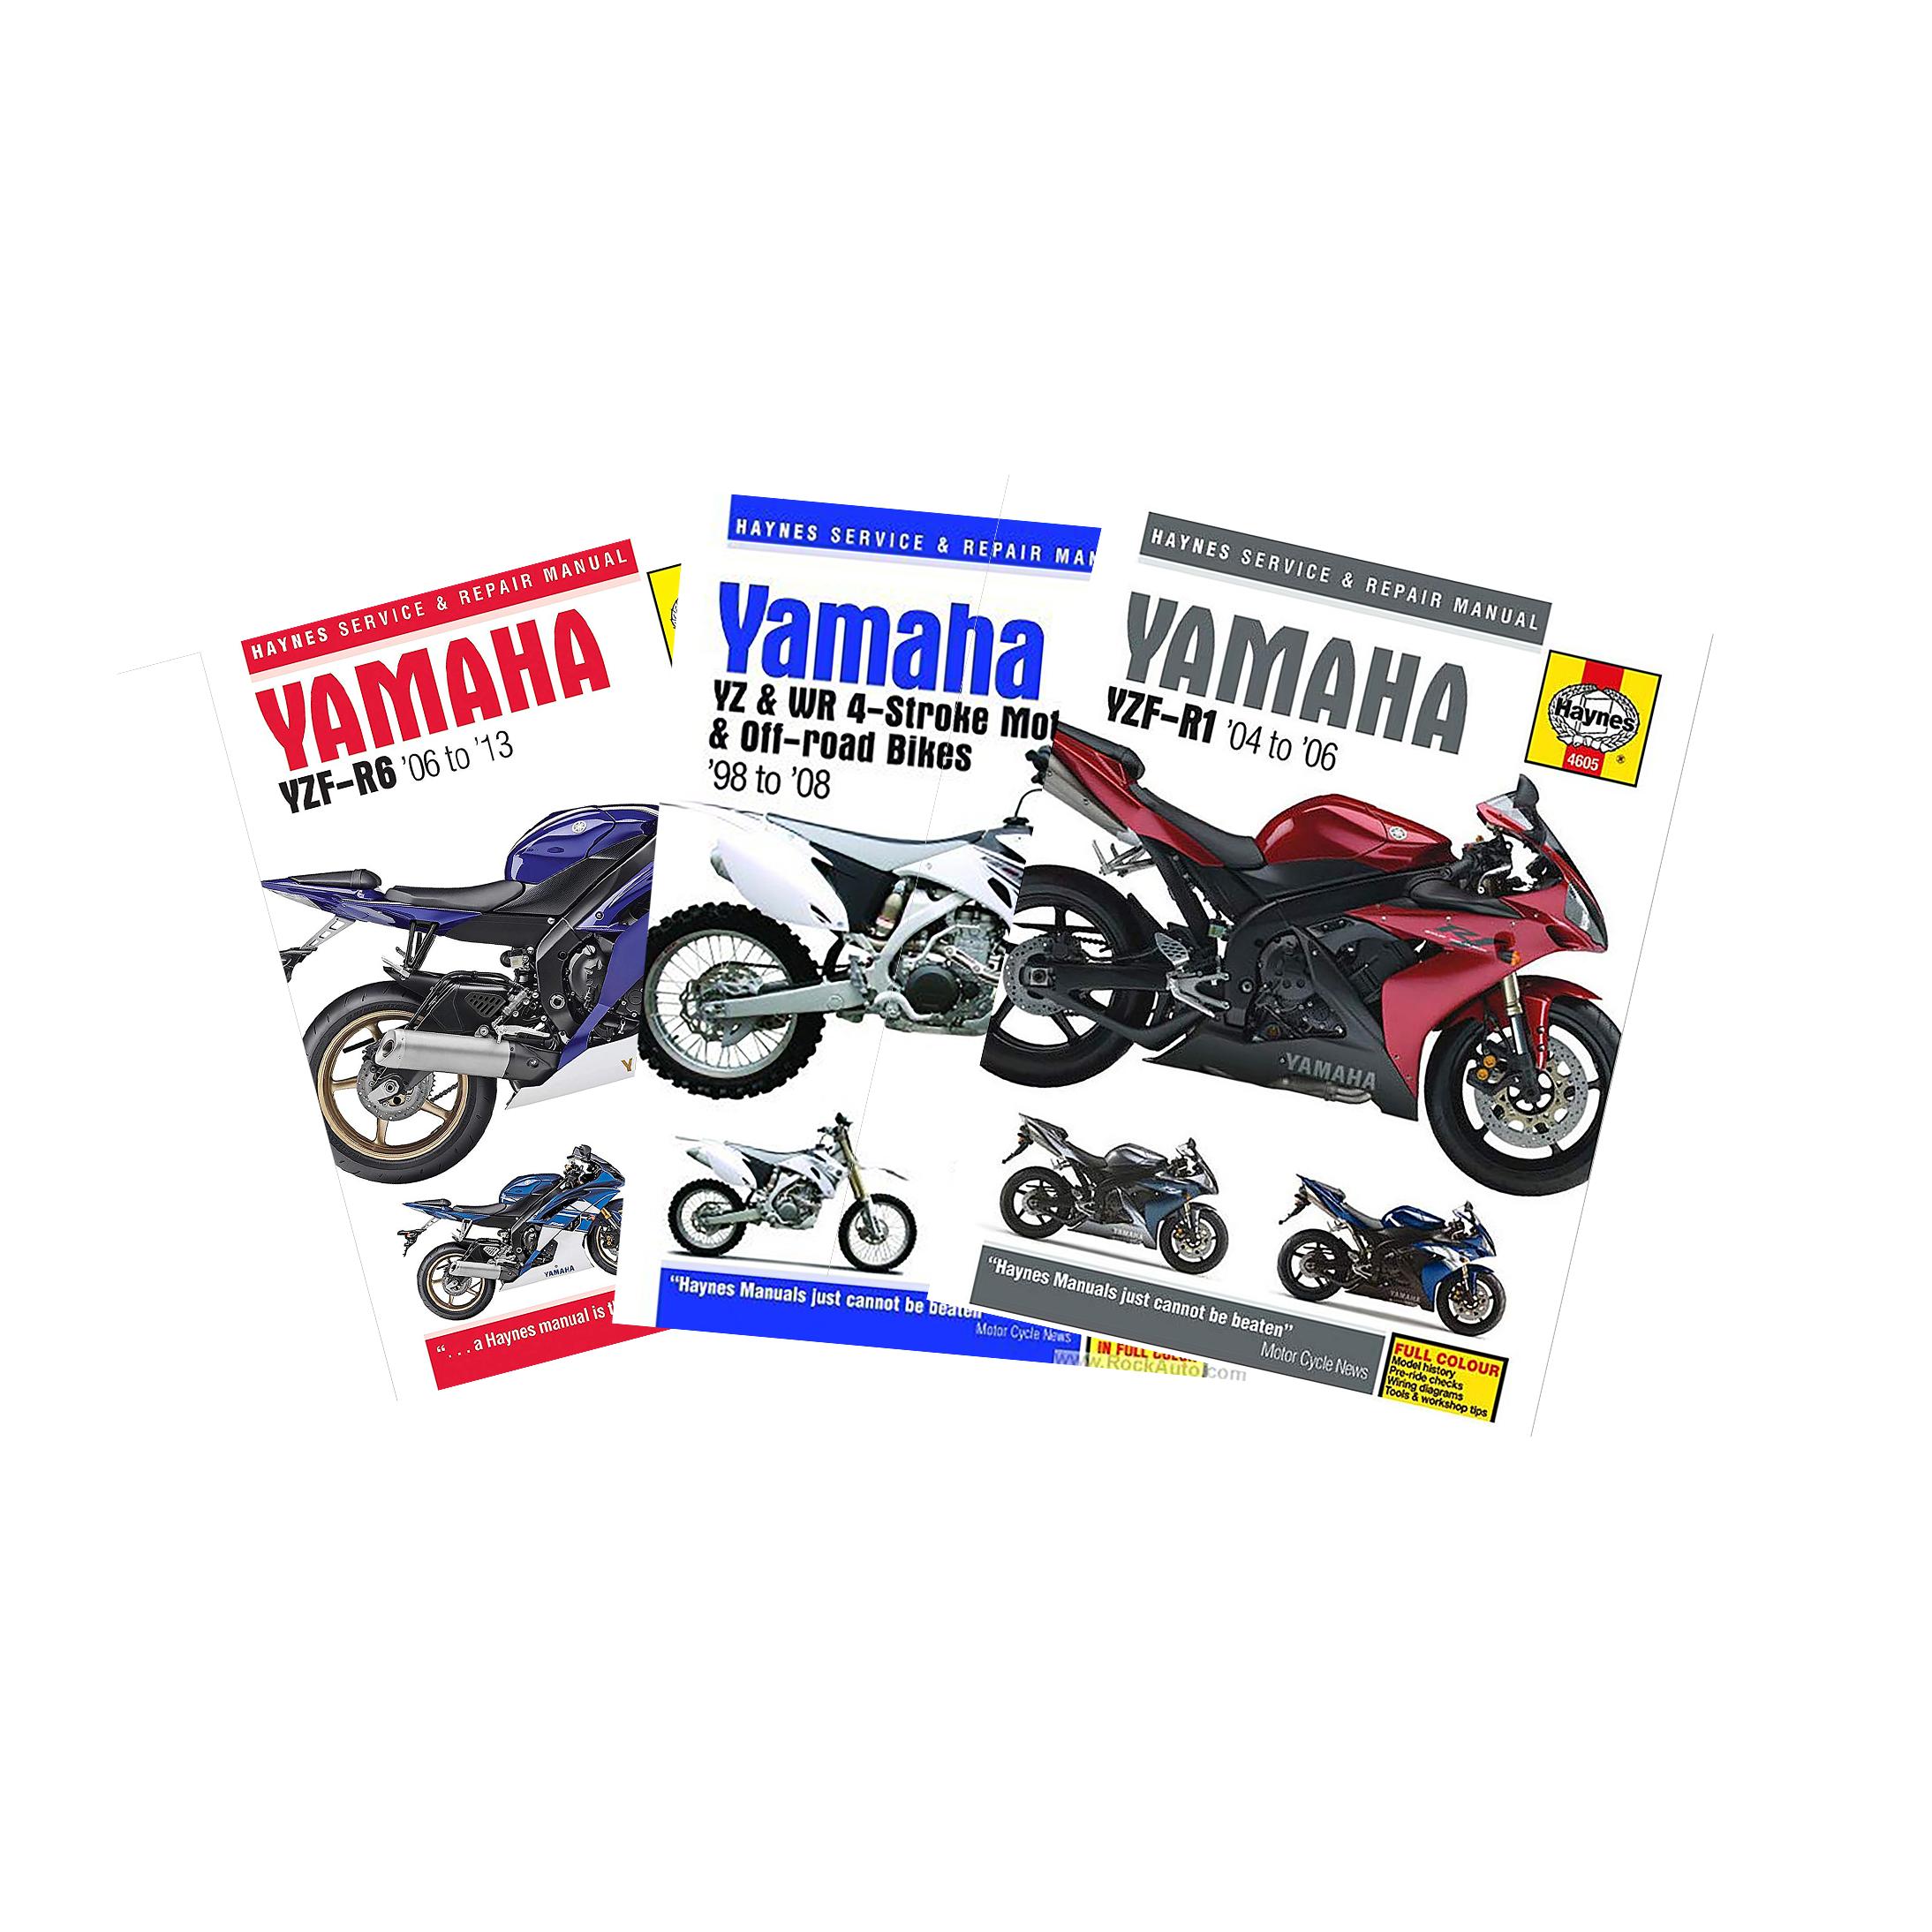 Haynes Reparationshåndbog Haynes Yamaha søg på model